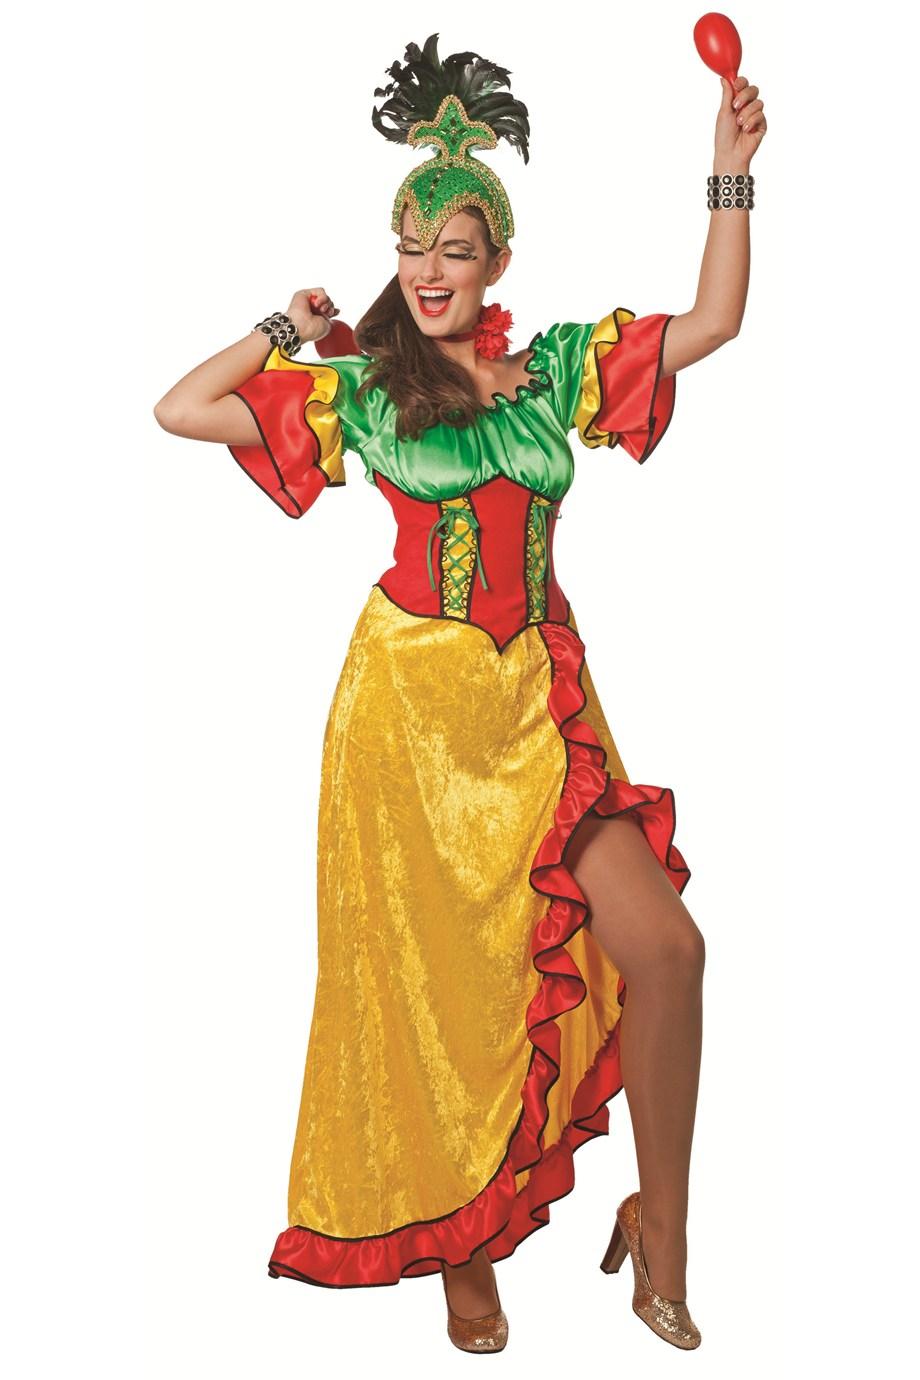 Tropical jurk Grenada voor dame